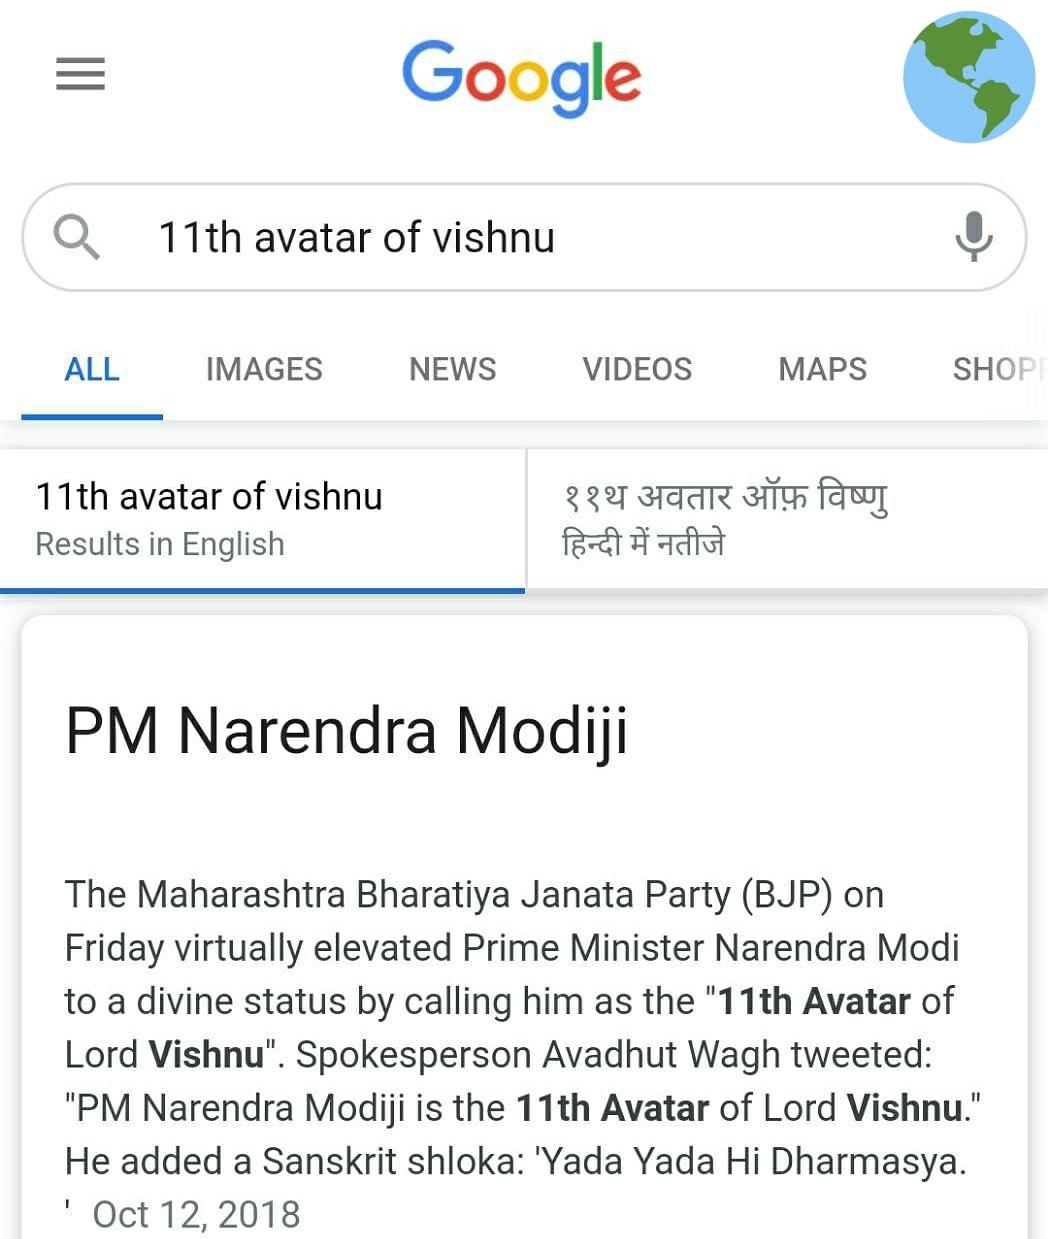 11th Avatar of Vishnu? Google 'thinks' it's PM Narendra Modi